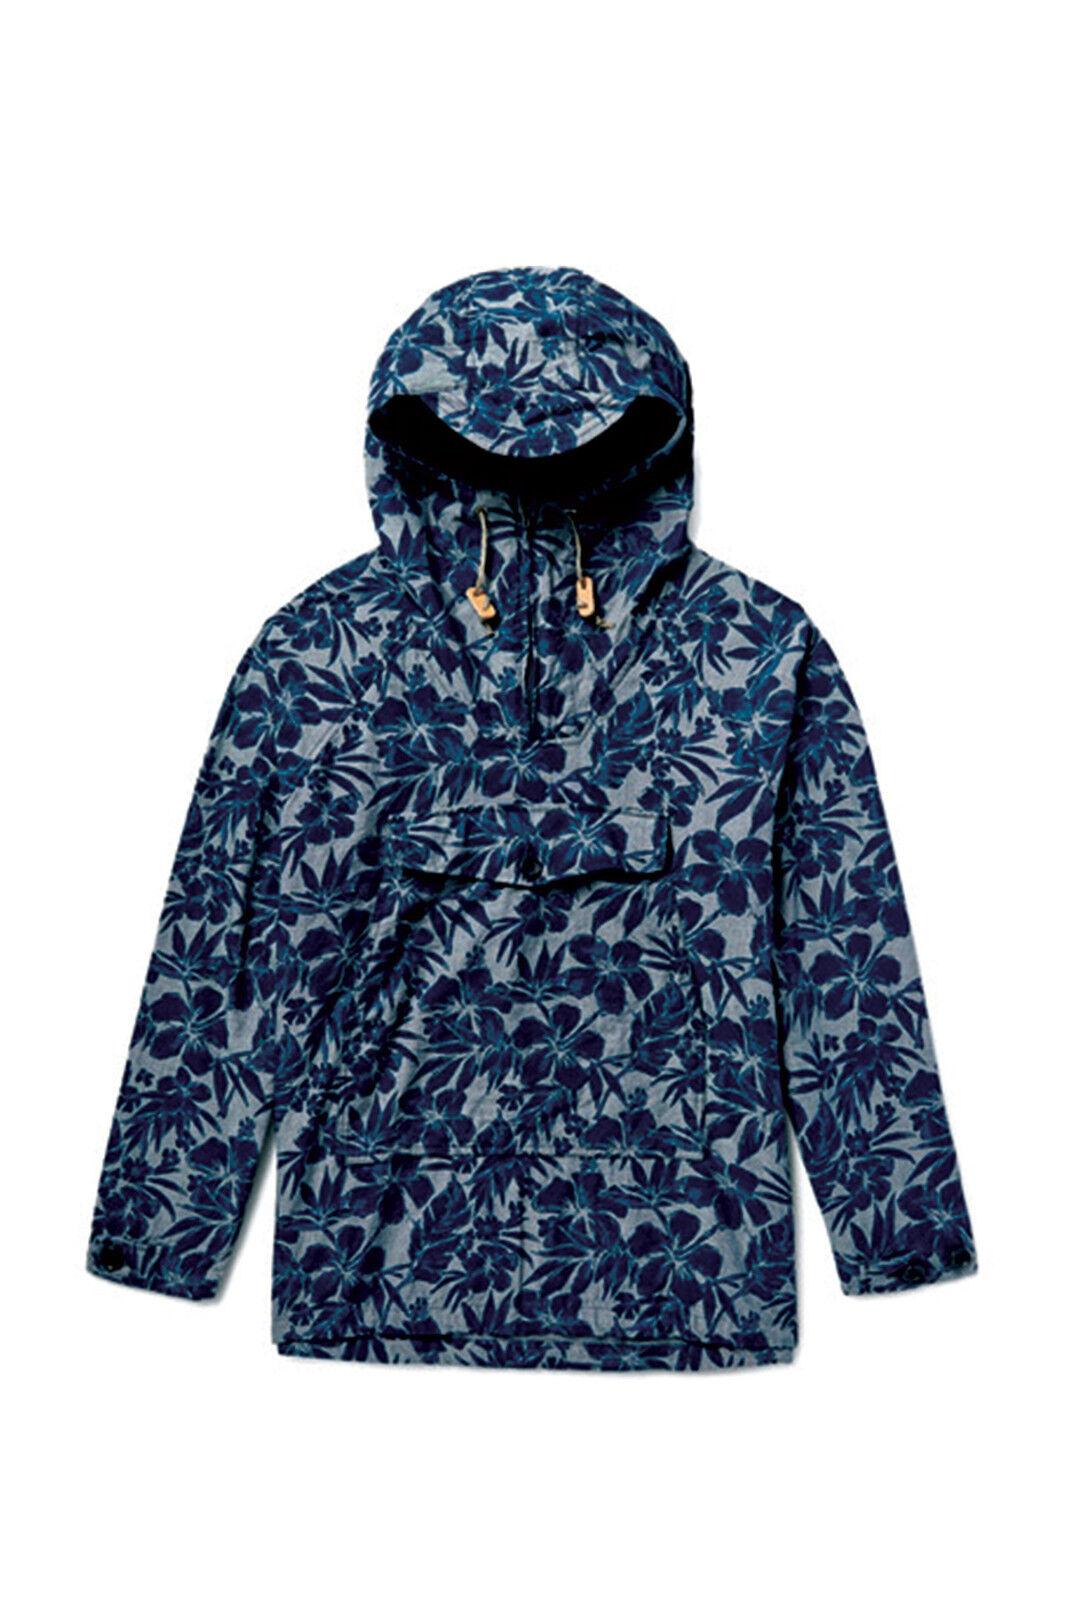 Battenwear Scout Anorak in Tropical Print, Größe Small - BNWT,